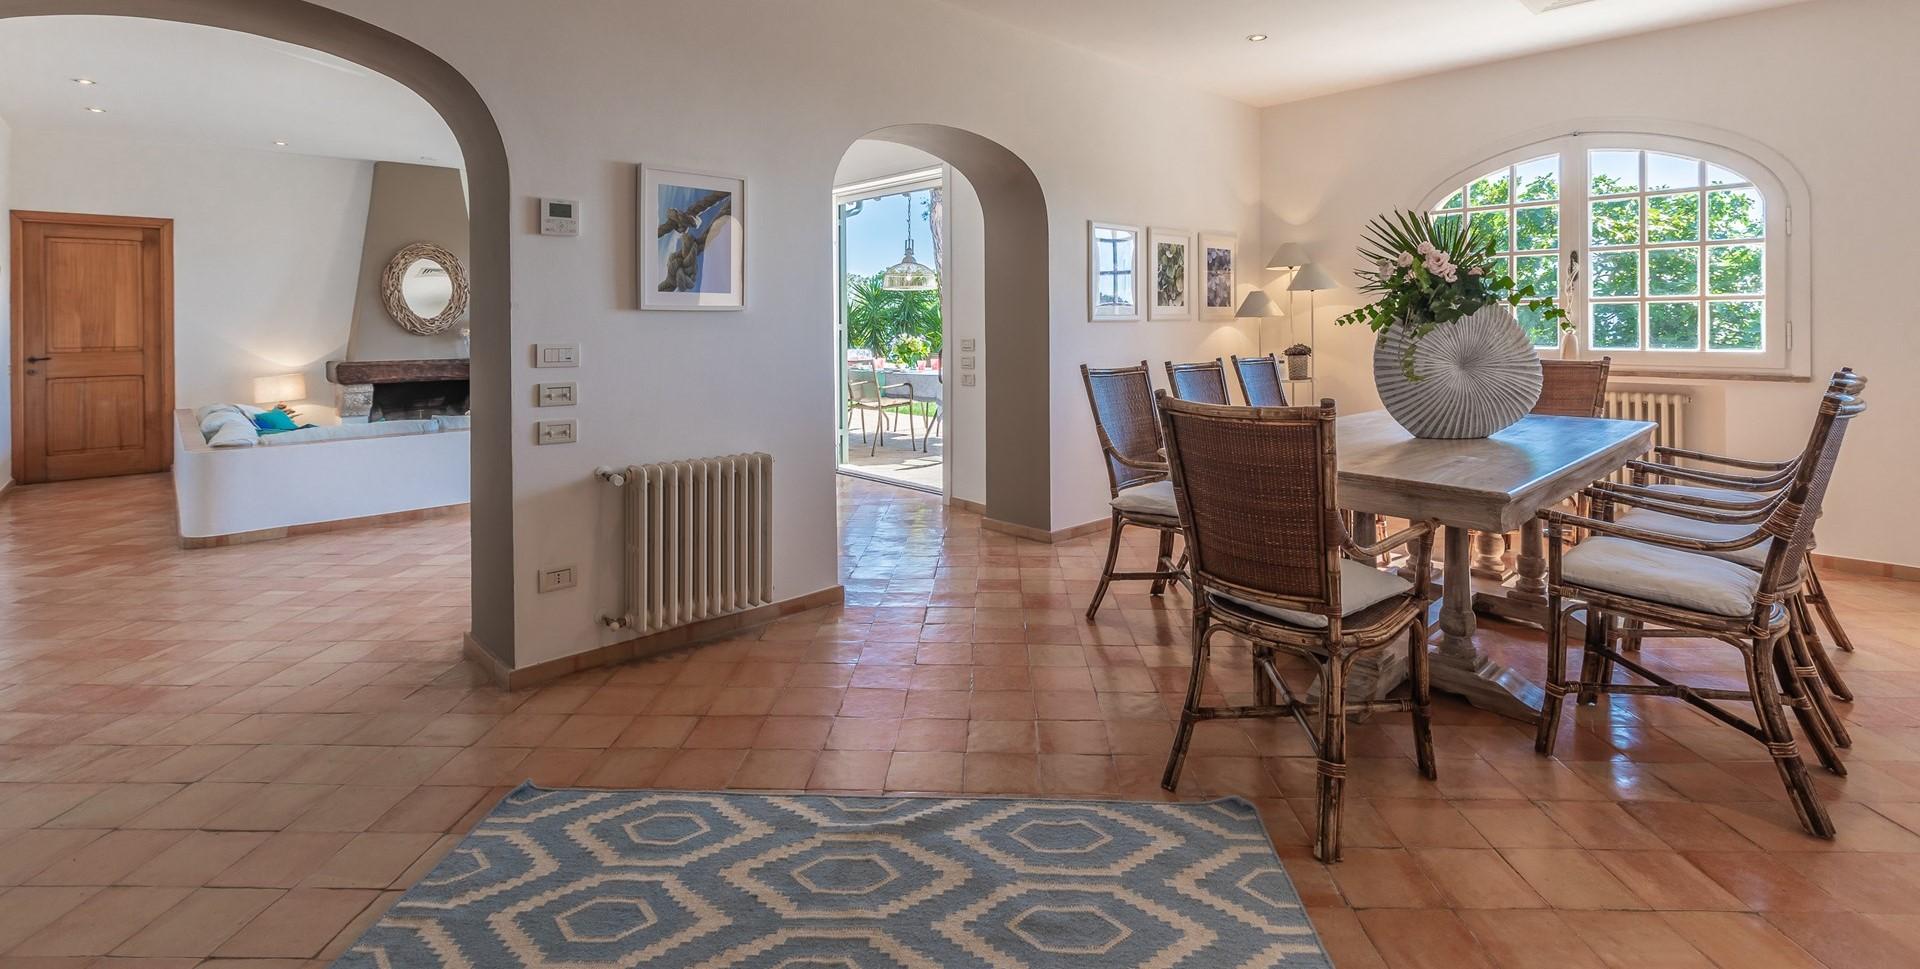 villa-vista-giglio-dining-room